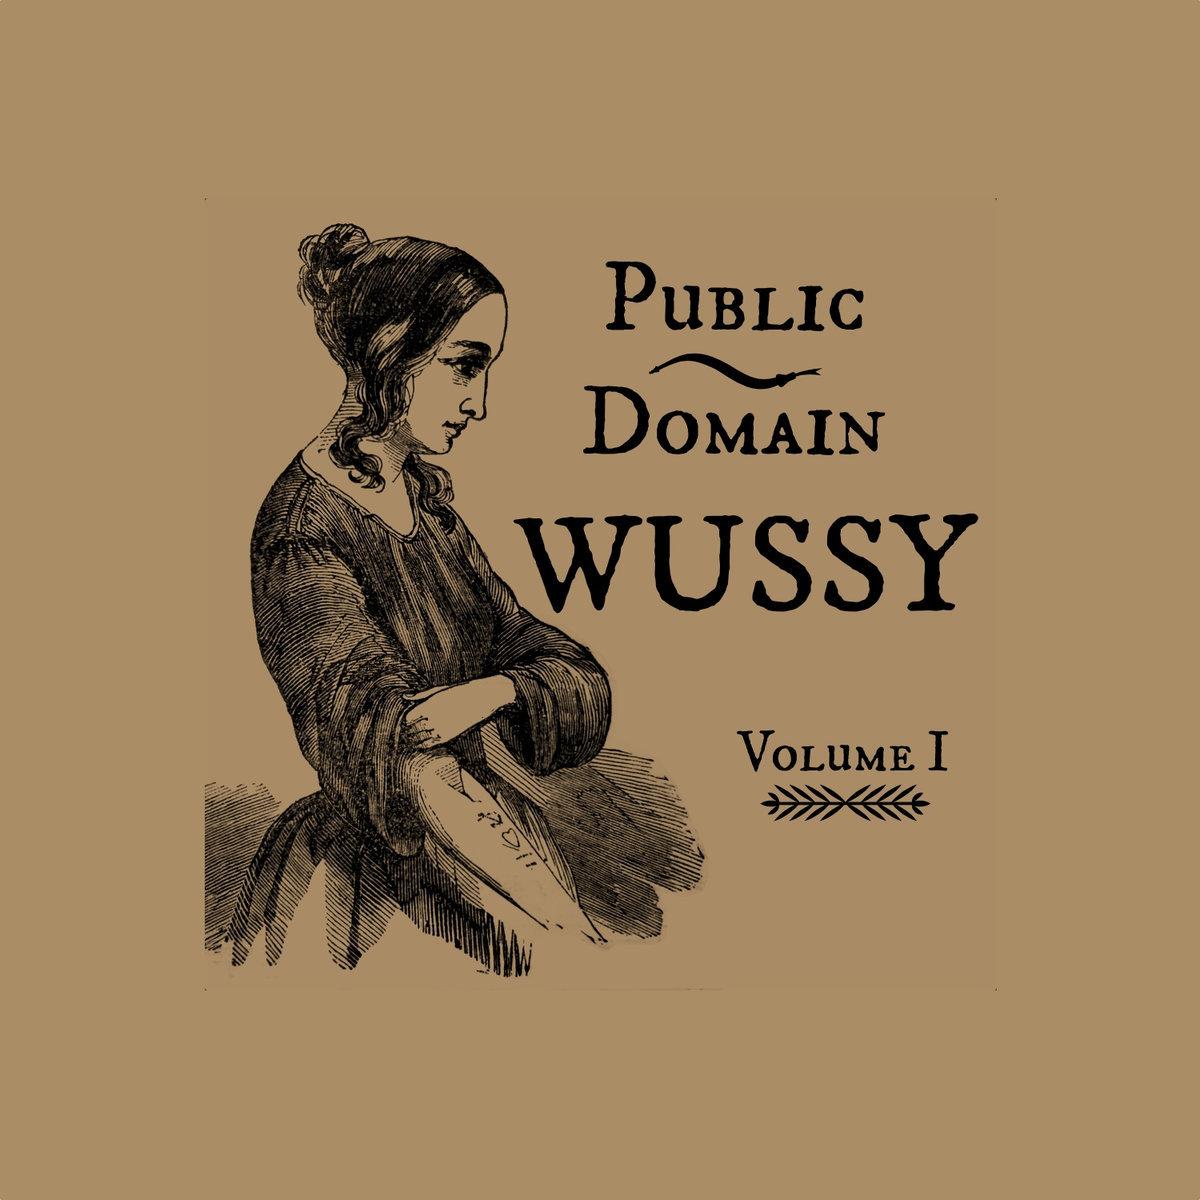 Public Domain, Volume I | Wussy